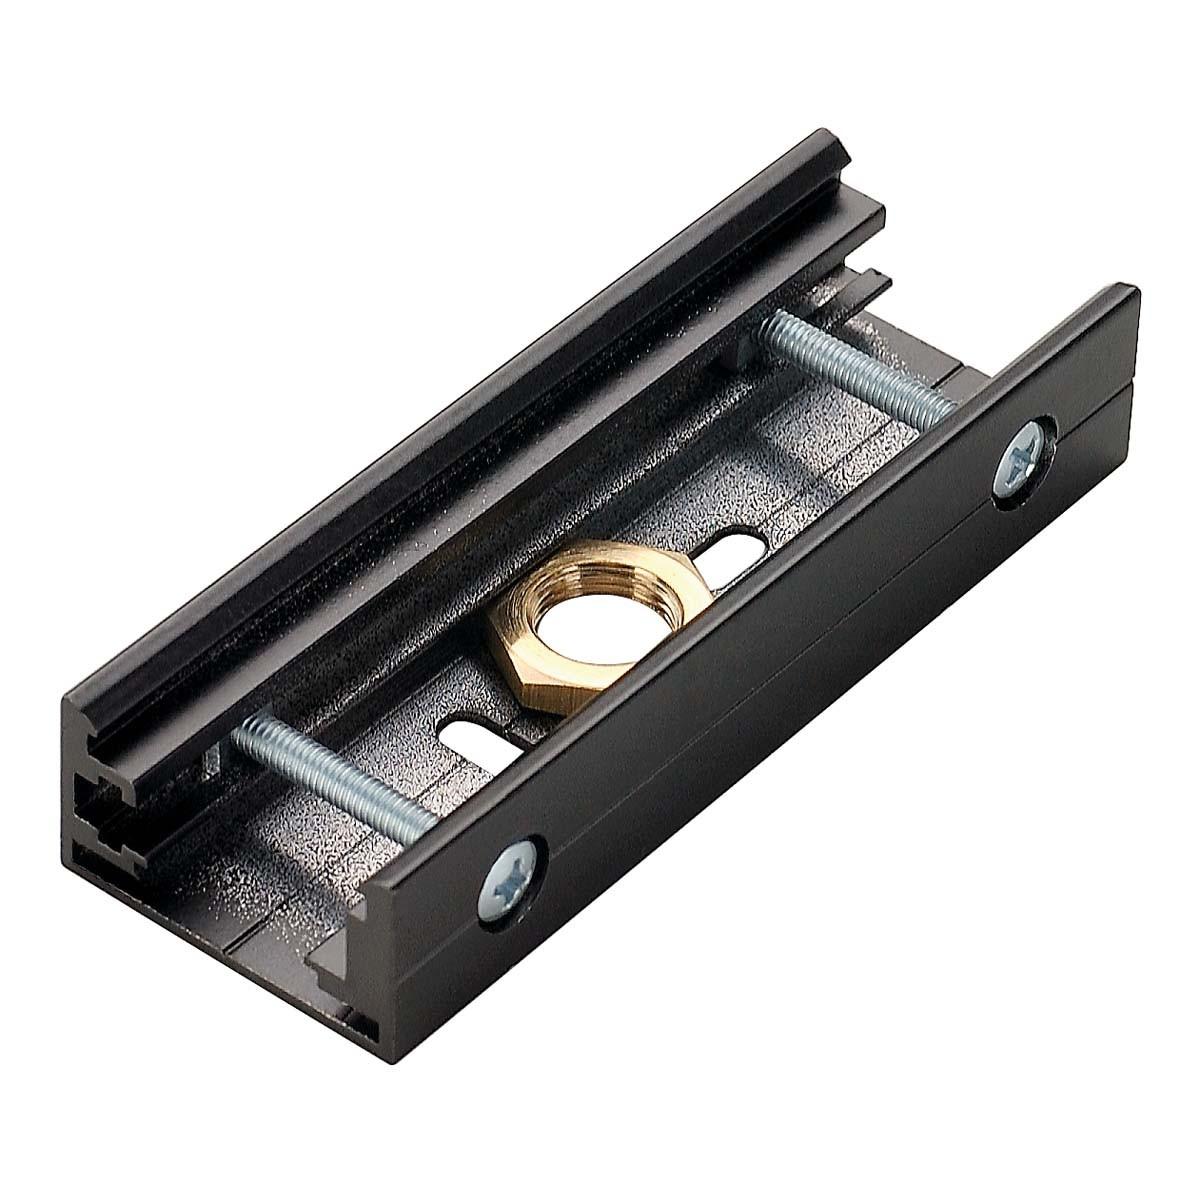 SLV 145600 Pendant Coupler Black Eutrac 3 Circuit 240V Surface Track Accessory